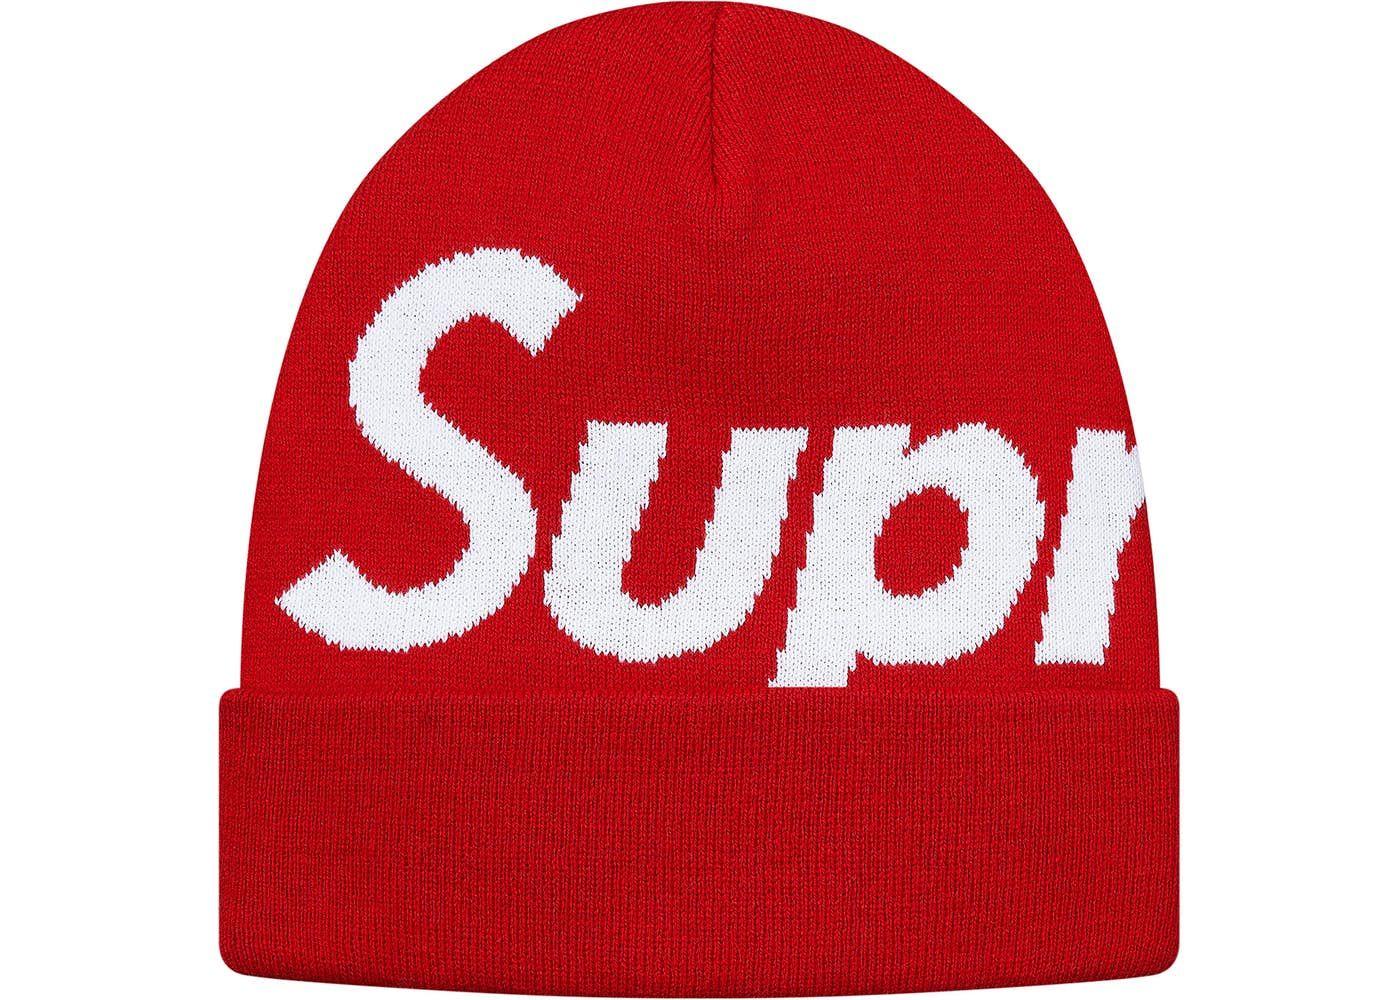 869bb852c Supreme Big Logo Beanie (FW17) Red in 2019 | Hats | Beanie, Supreme ...